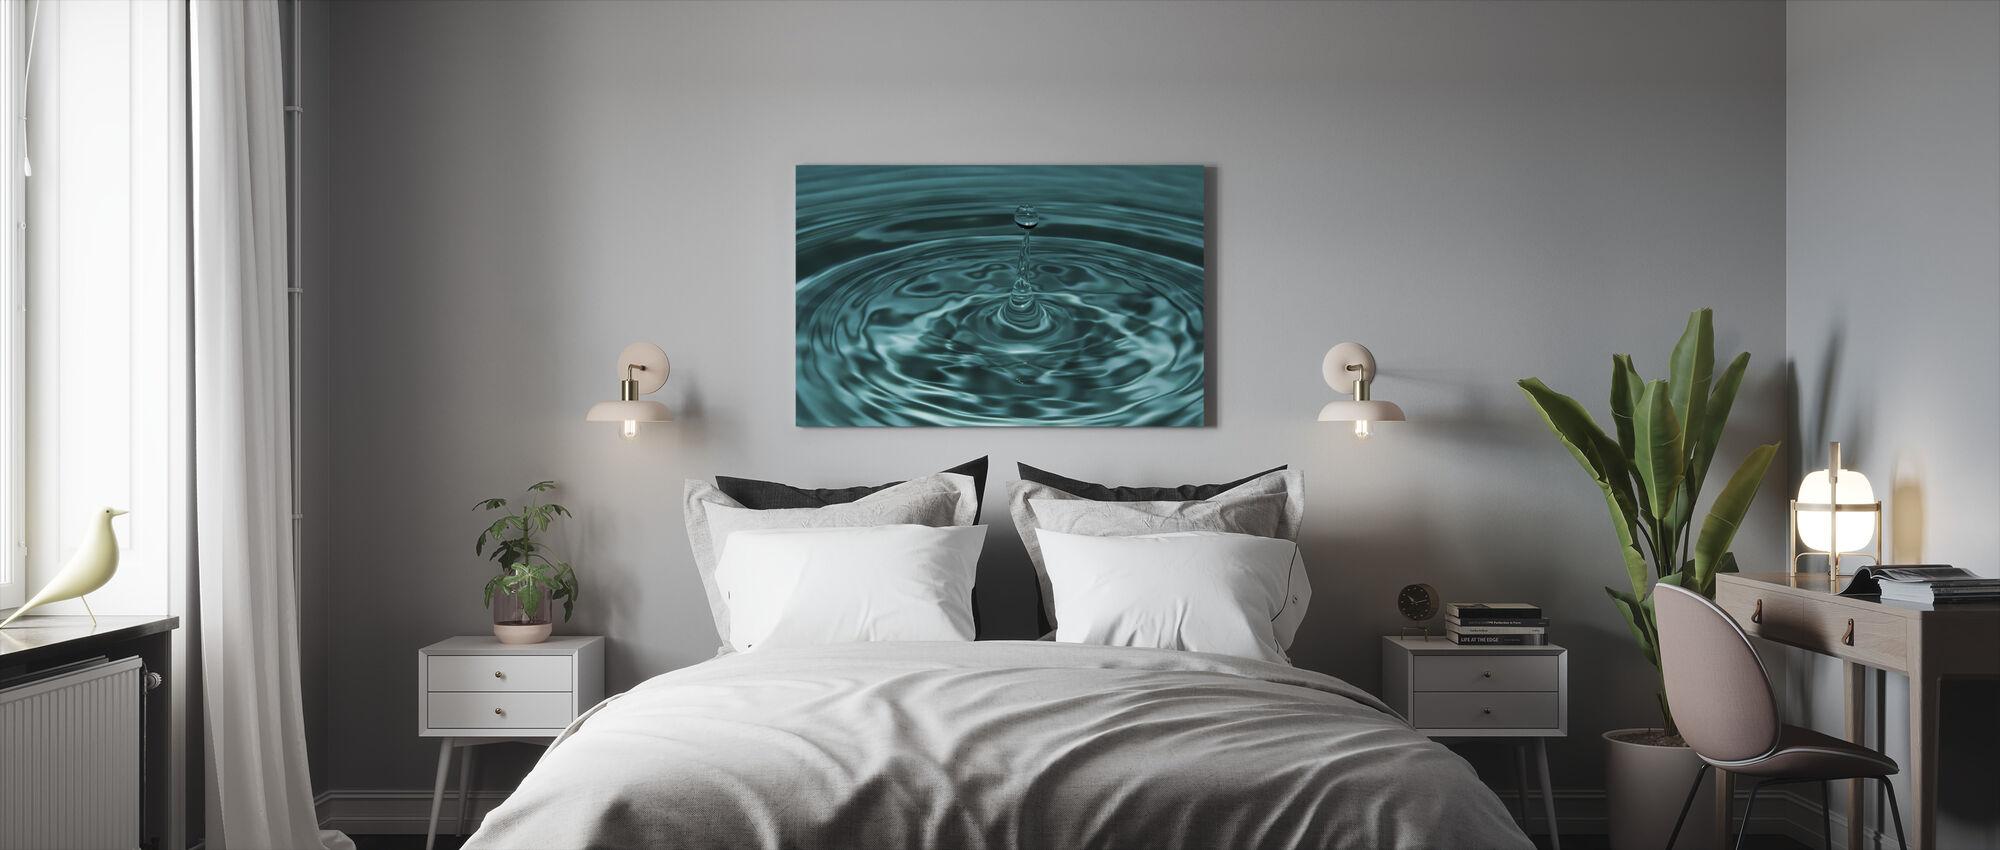 Droplet - Canvas print - Bedroom